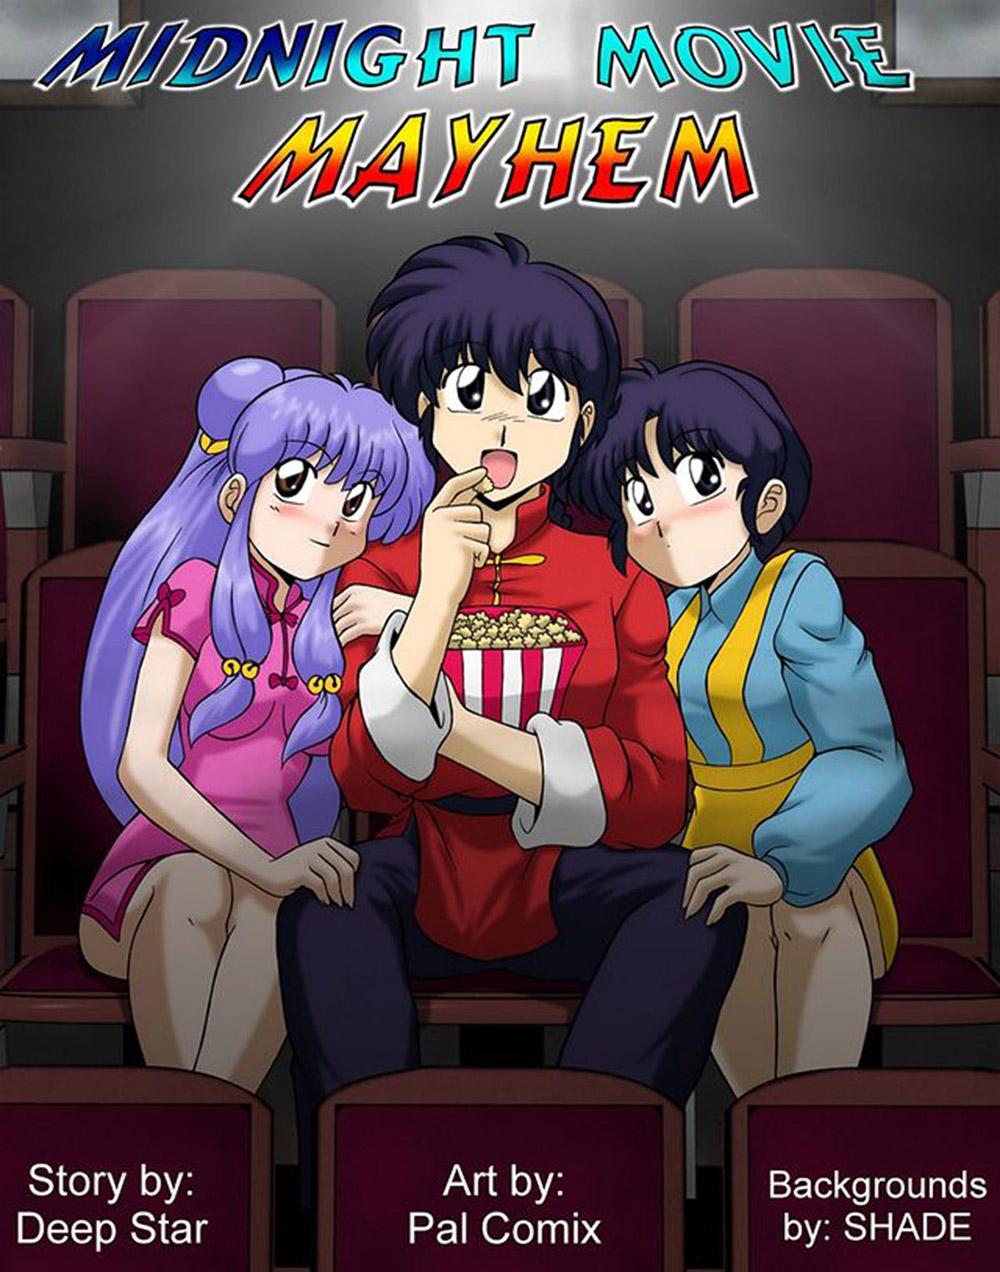 MIDNIGHT Movie Mayhem